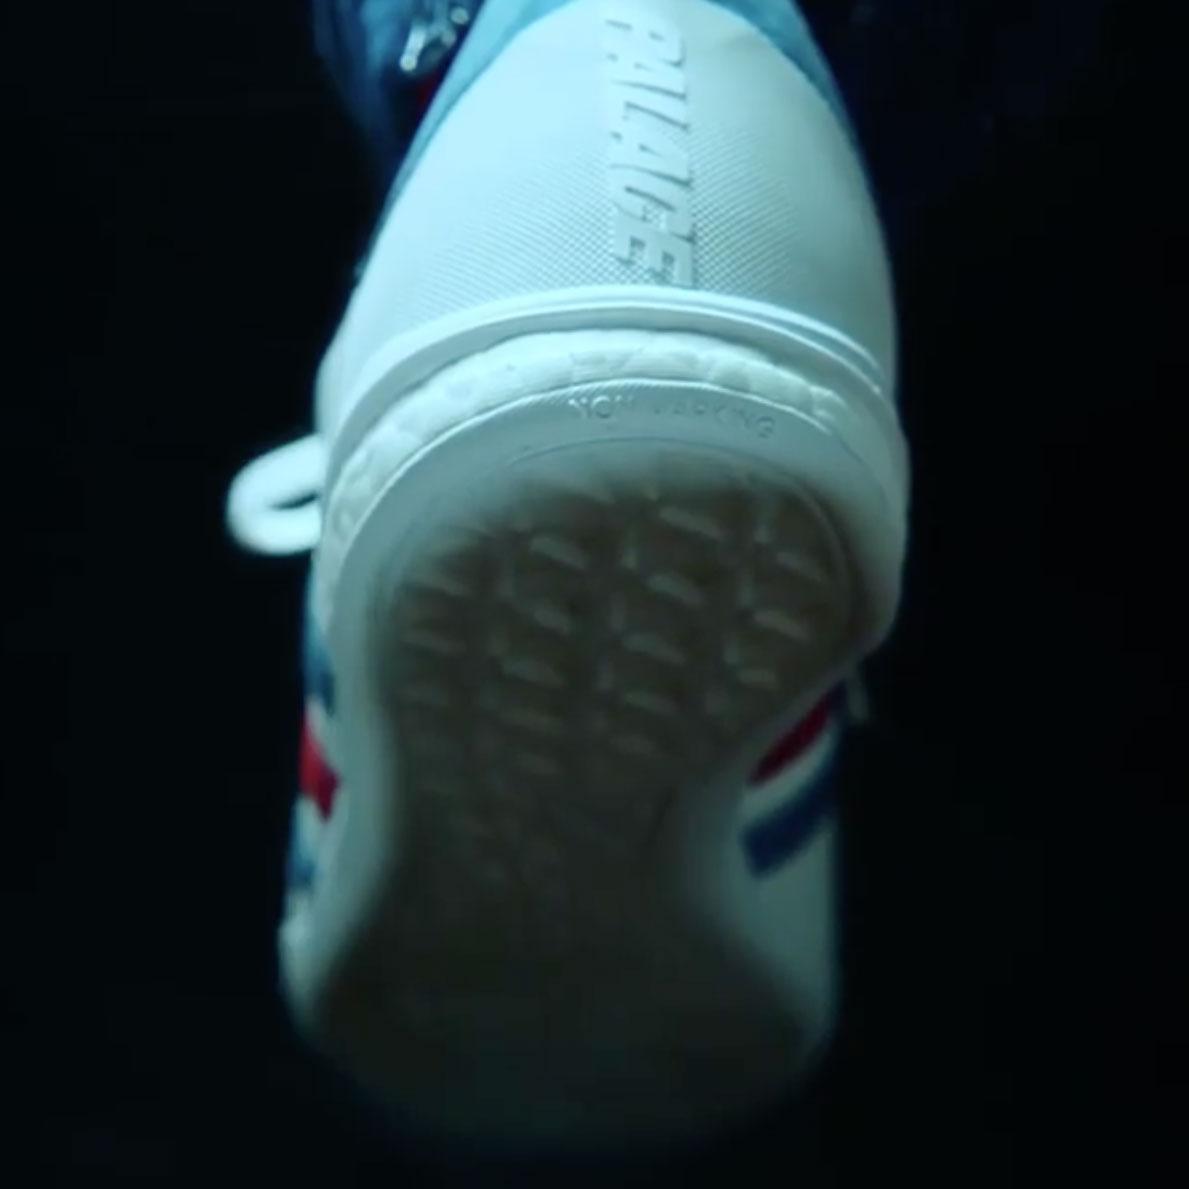 Palace x adidas Originals Previews New FW16 Footwear